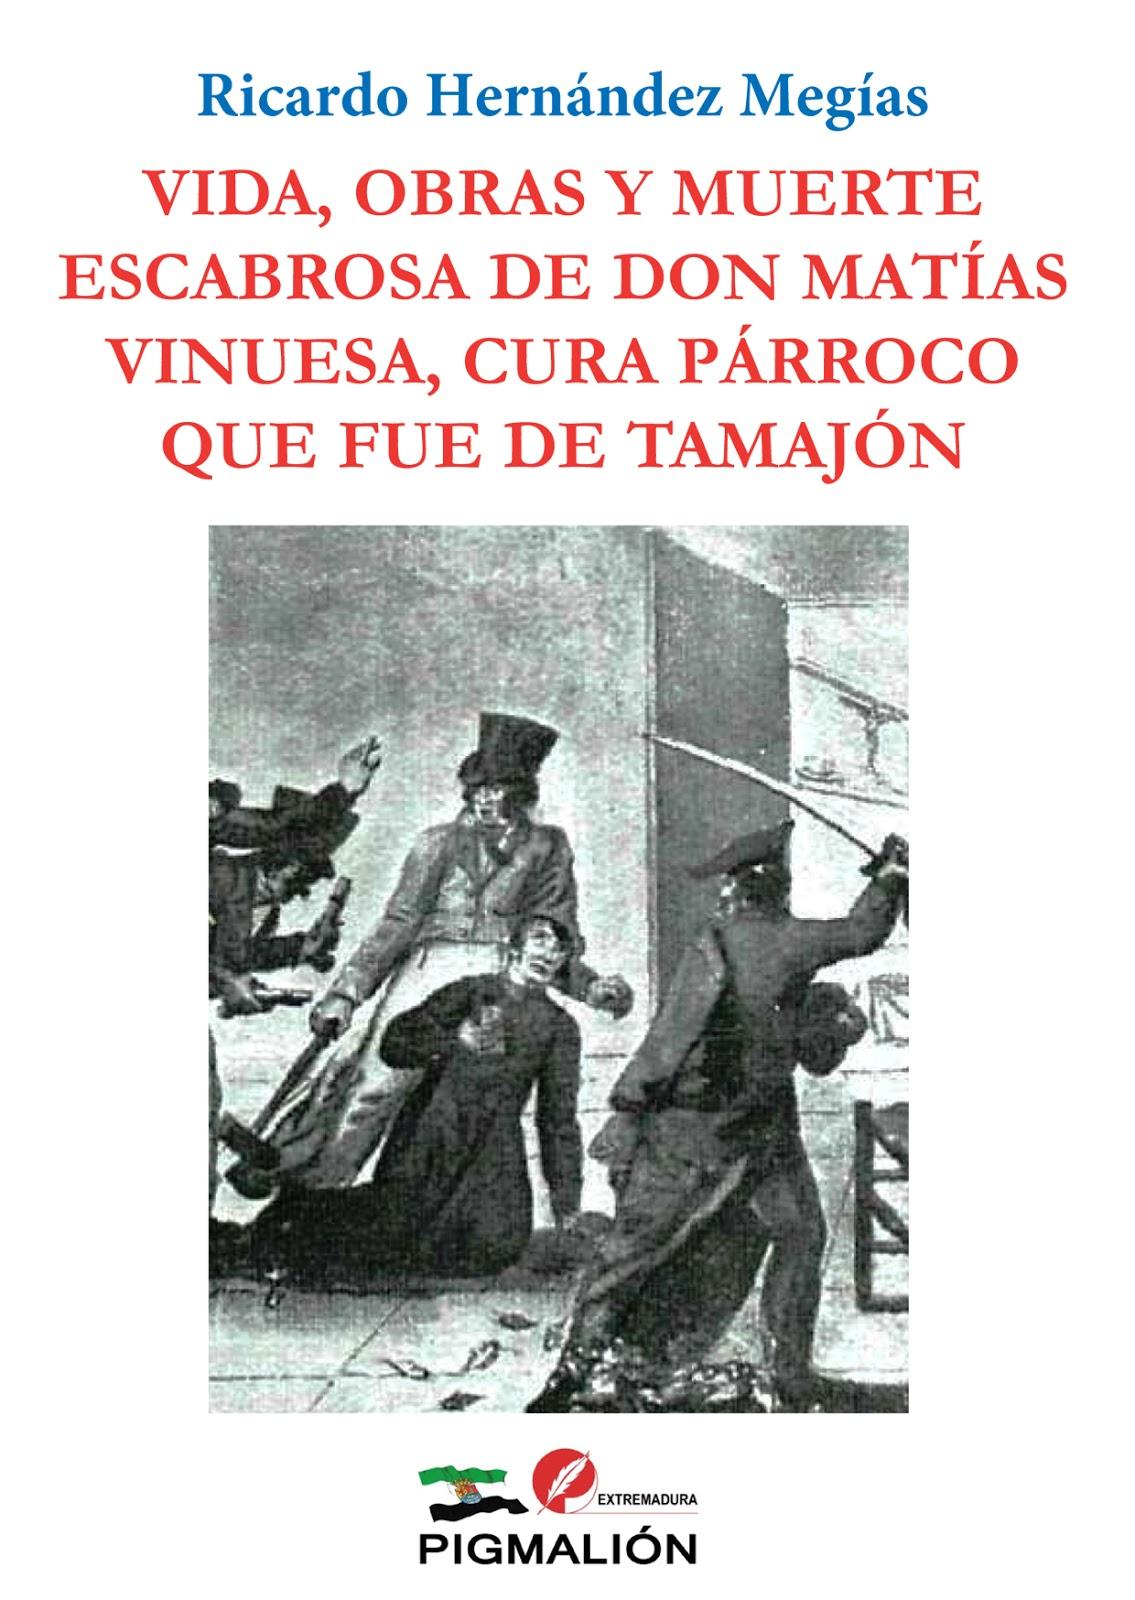 cabeza 3 - La Cárcel de la Corona en la calle de la Cabeza en Lavapiés